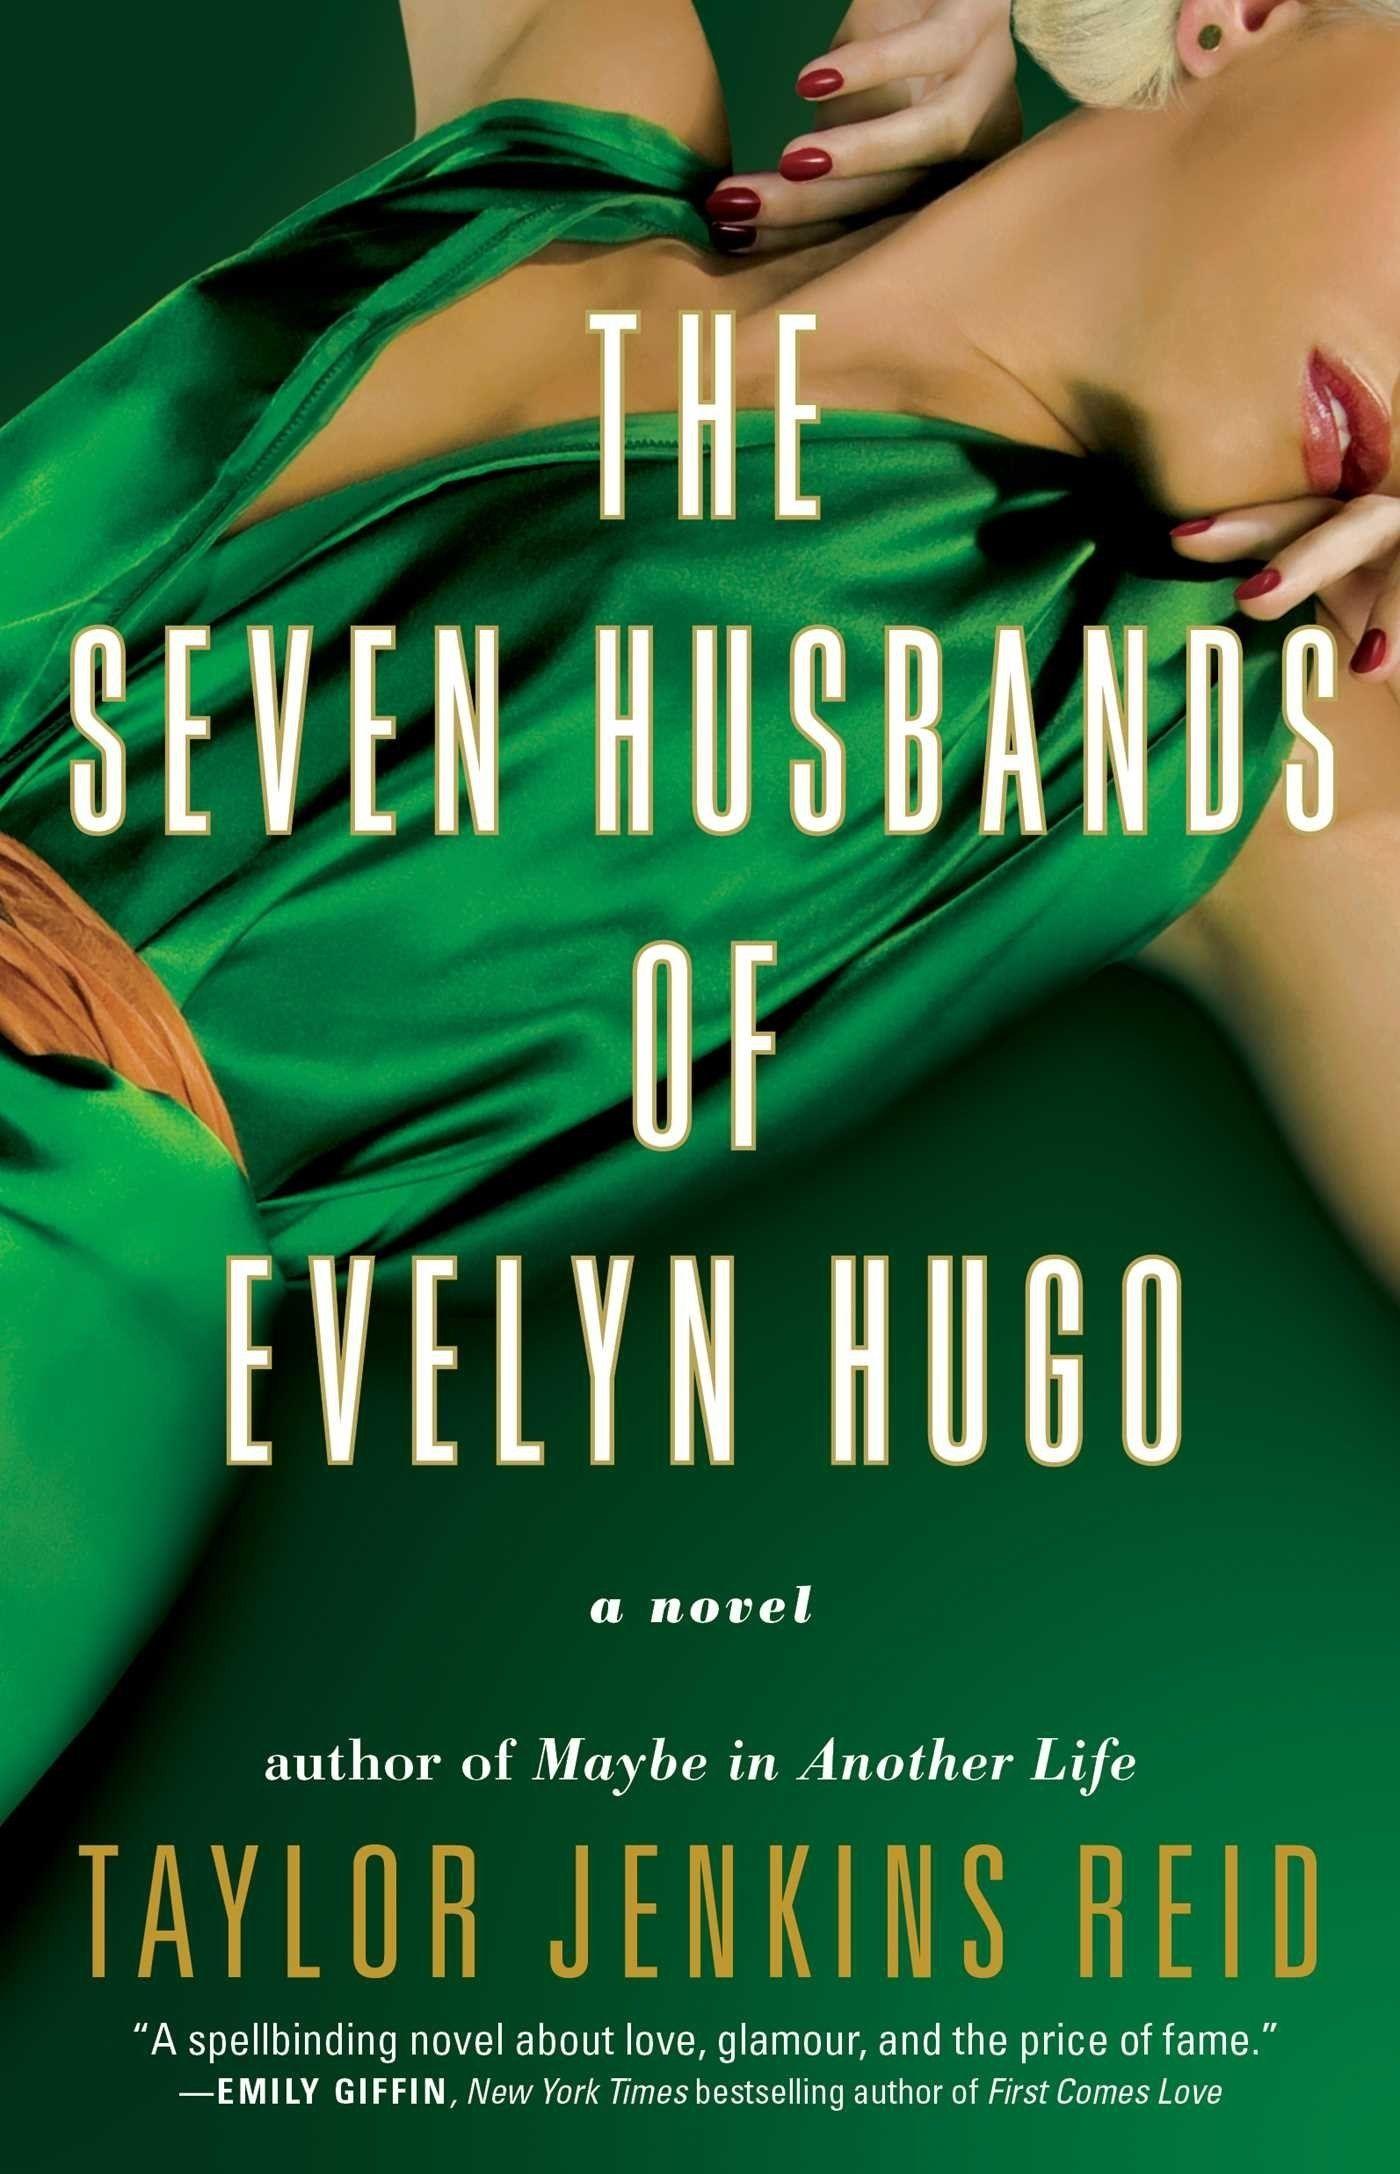 The Seven Husbands of Evelyn Hugo by Taylor Jenkin